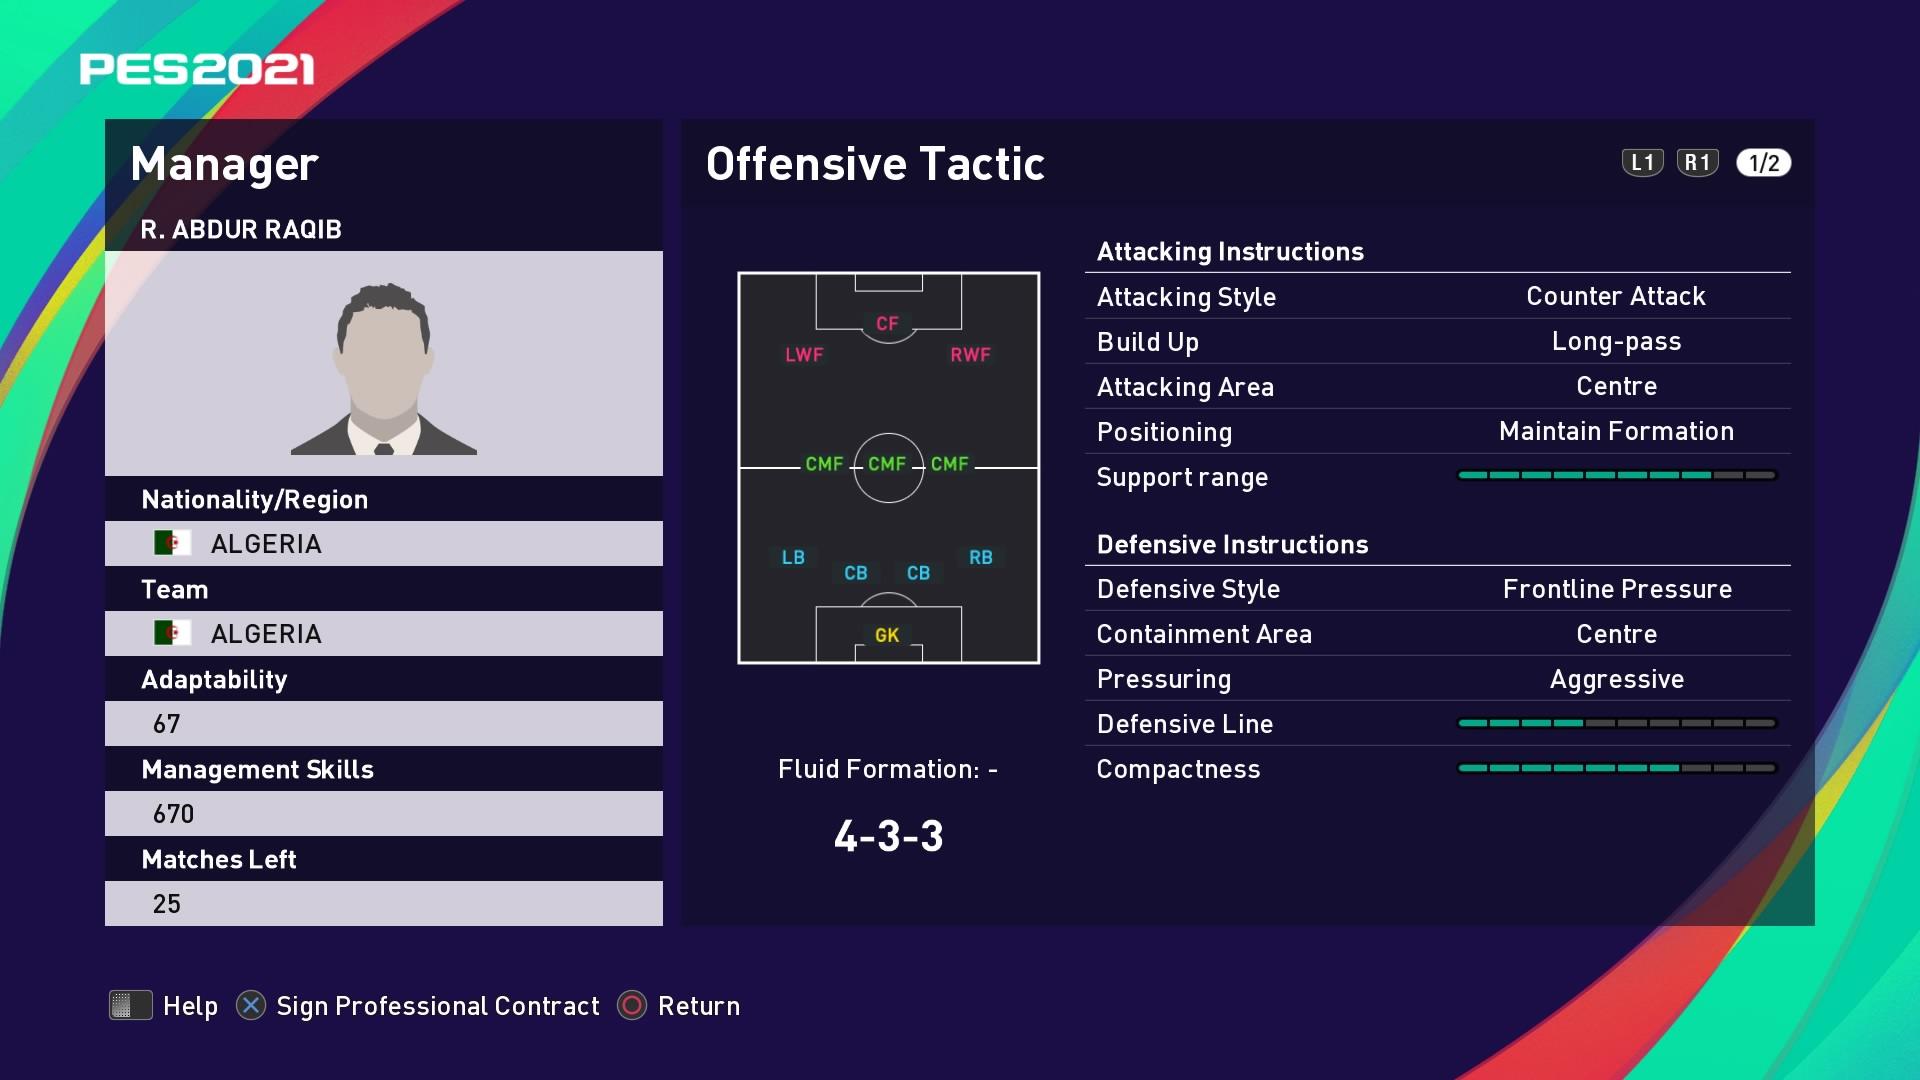 R. Abdur Raqib (Djamel Belmadi) Offensive Tactic in PES 2021 myClub